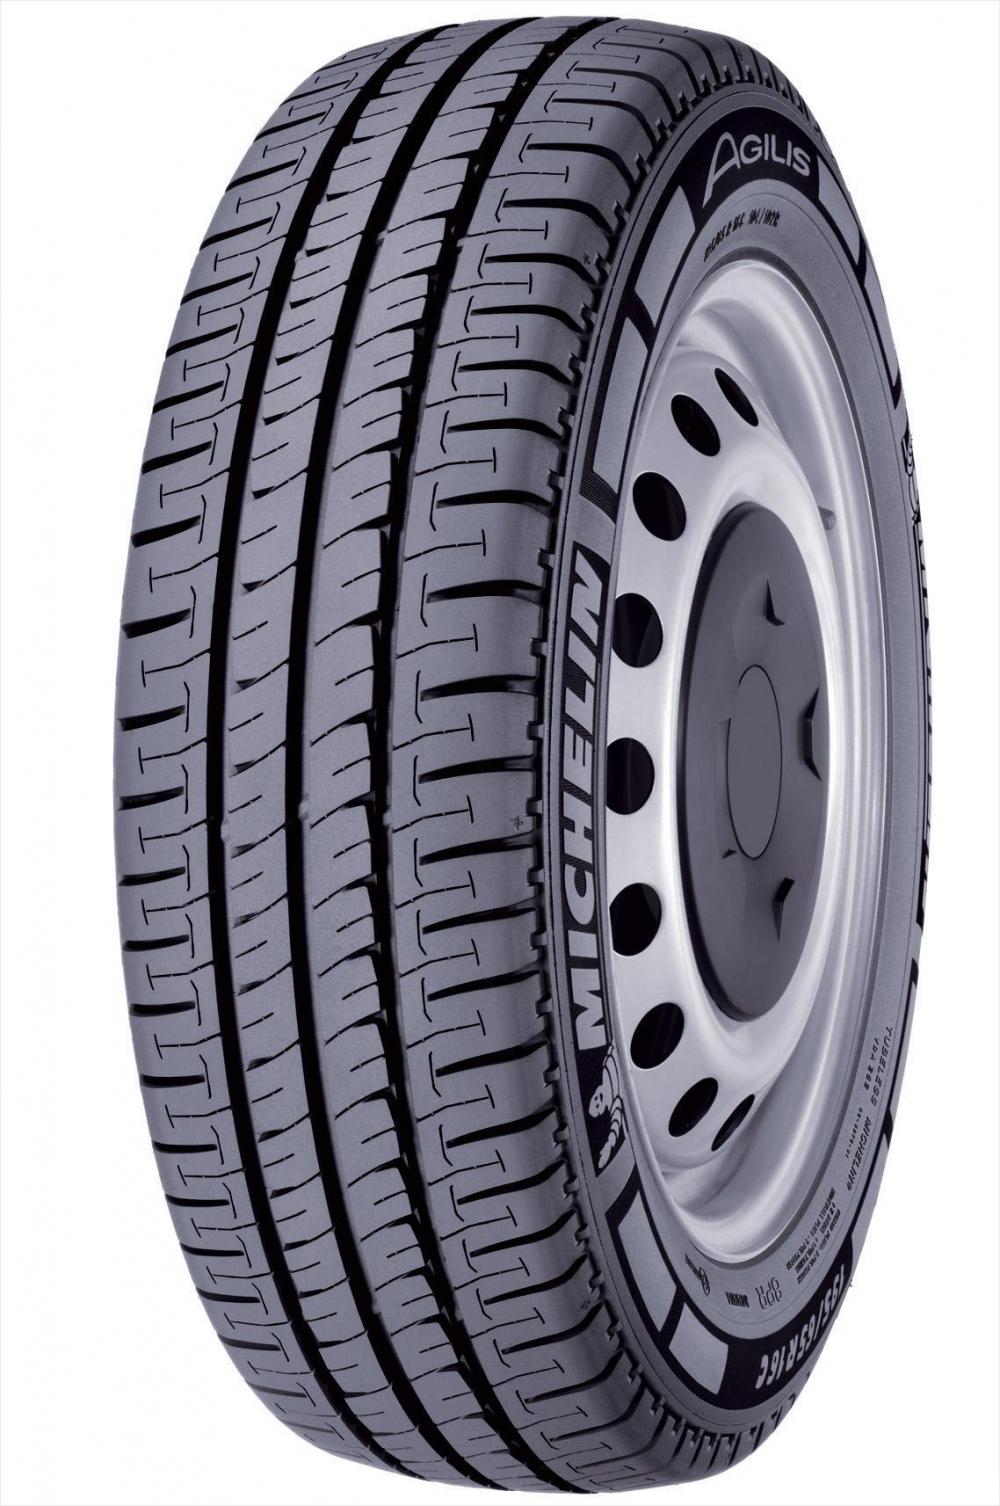 Michelin AGILISPLUS pneumatiky